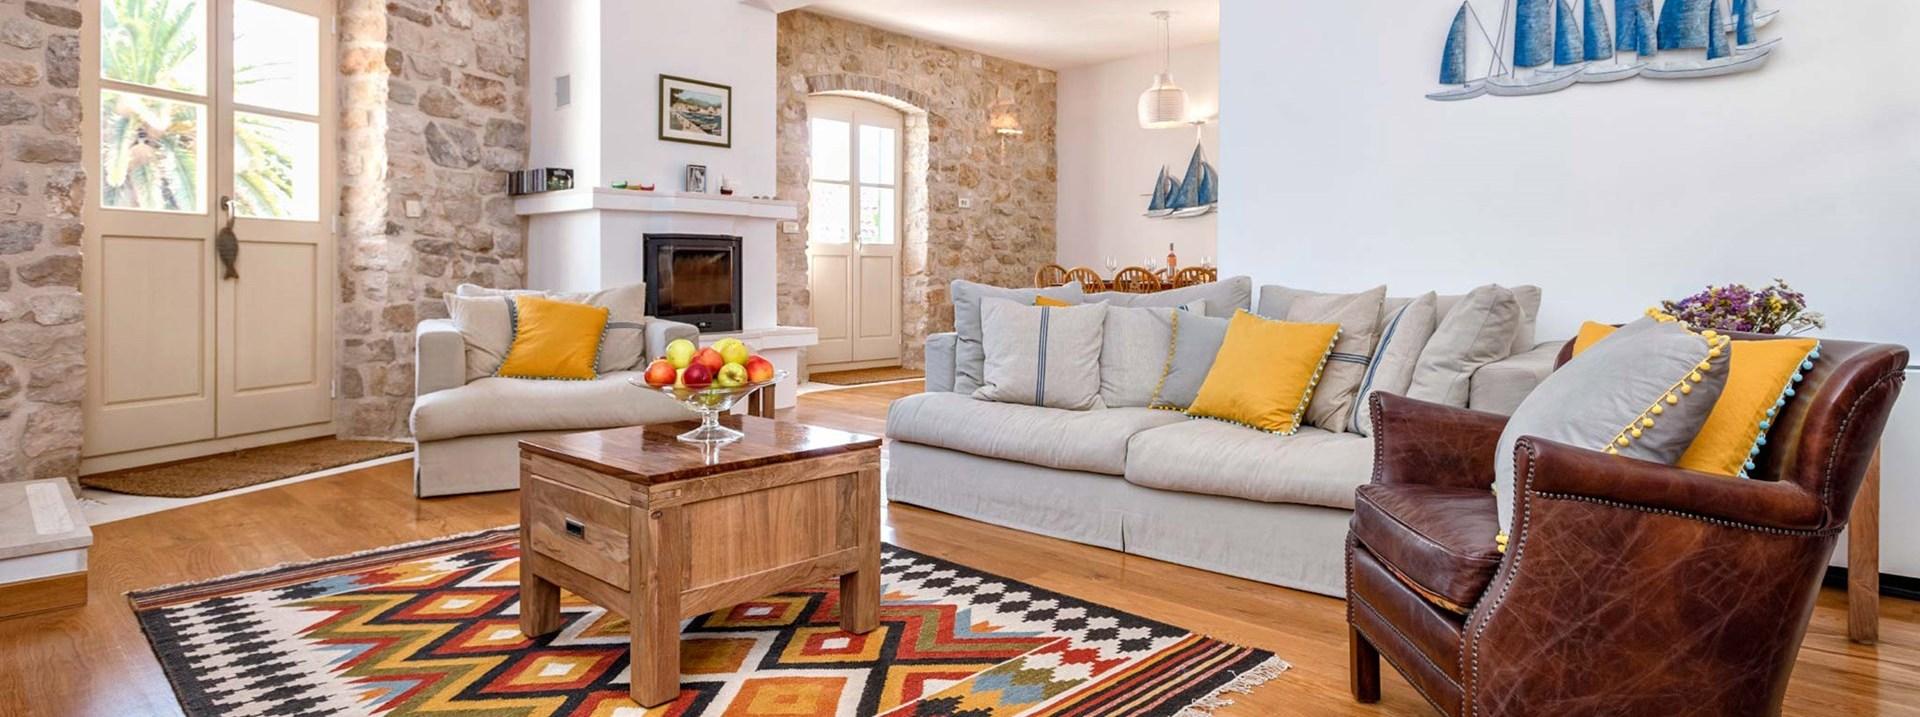 luxury-family-villa-hvar-croatia